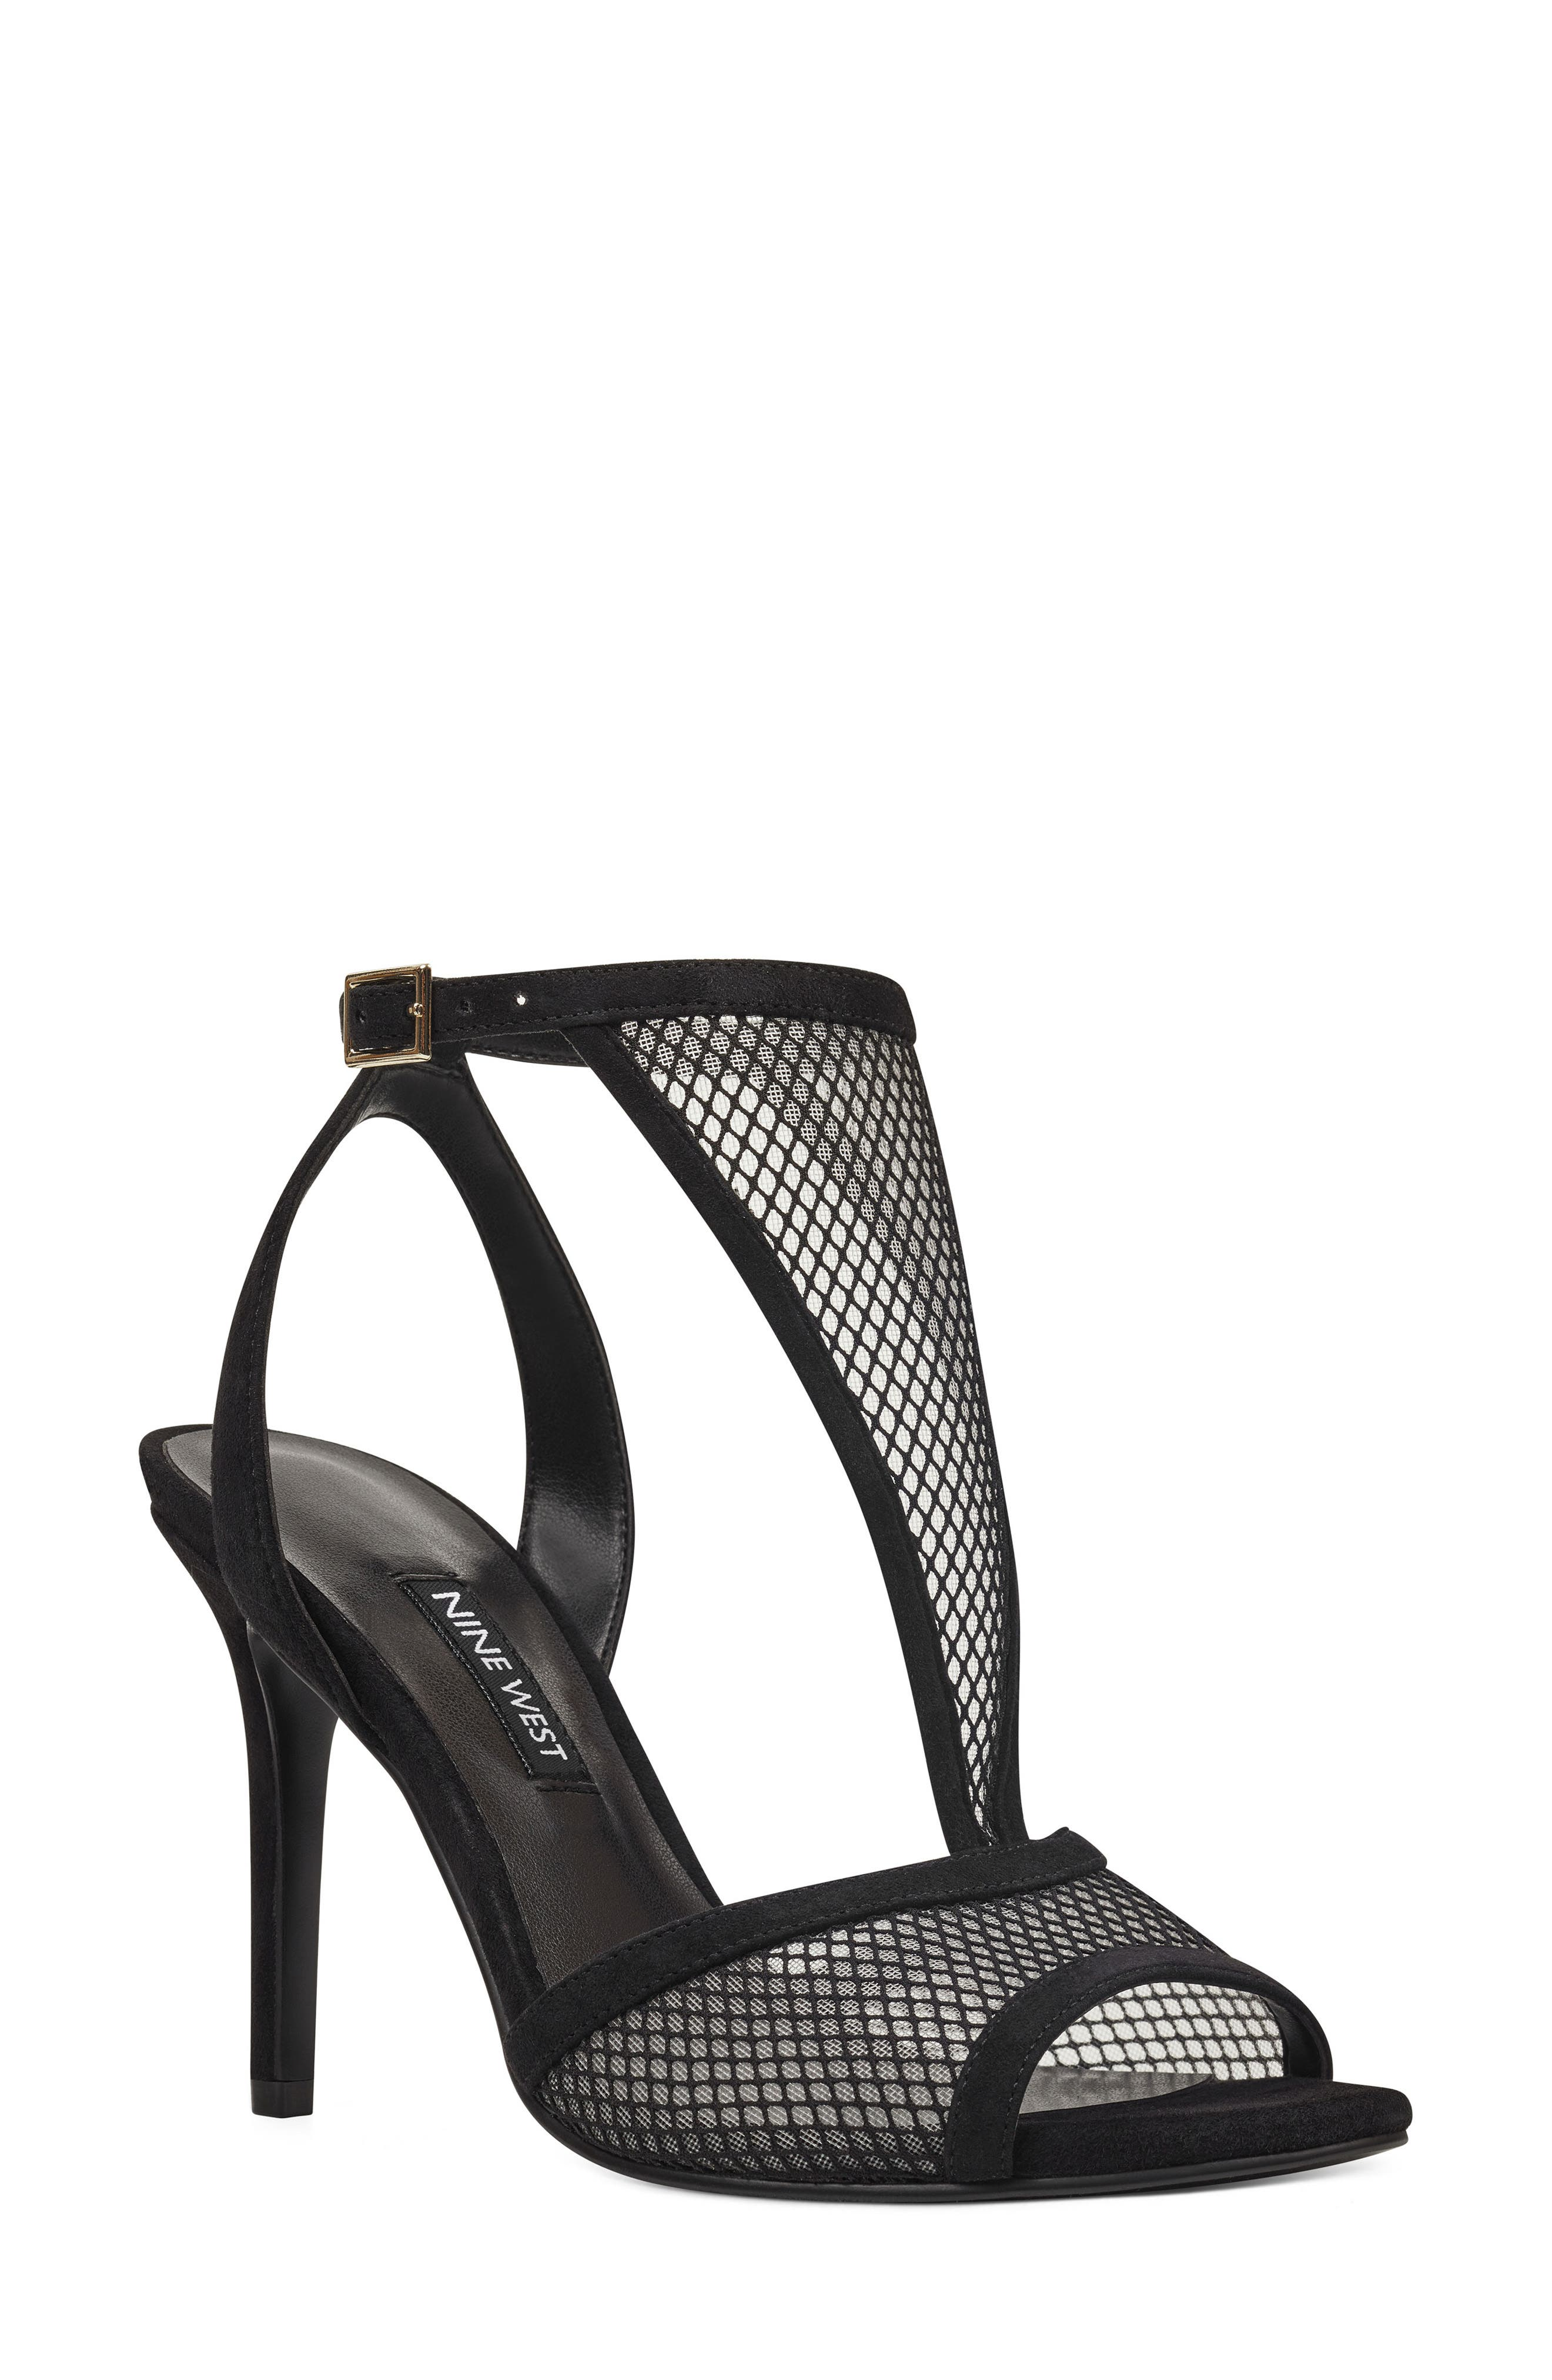 Manchon 2 Ankle Strap Sandal, Main, color, BLACK STRETCH MESH/ LEATHER